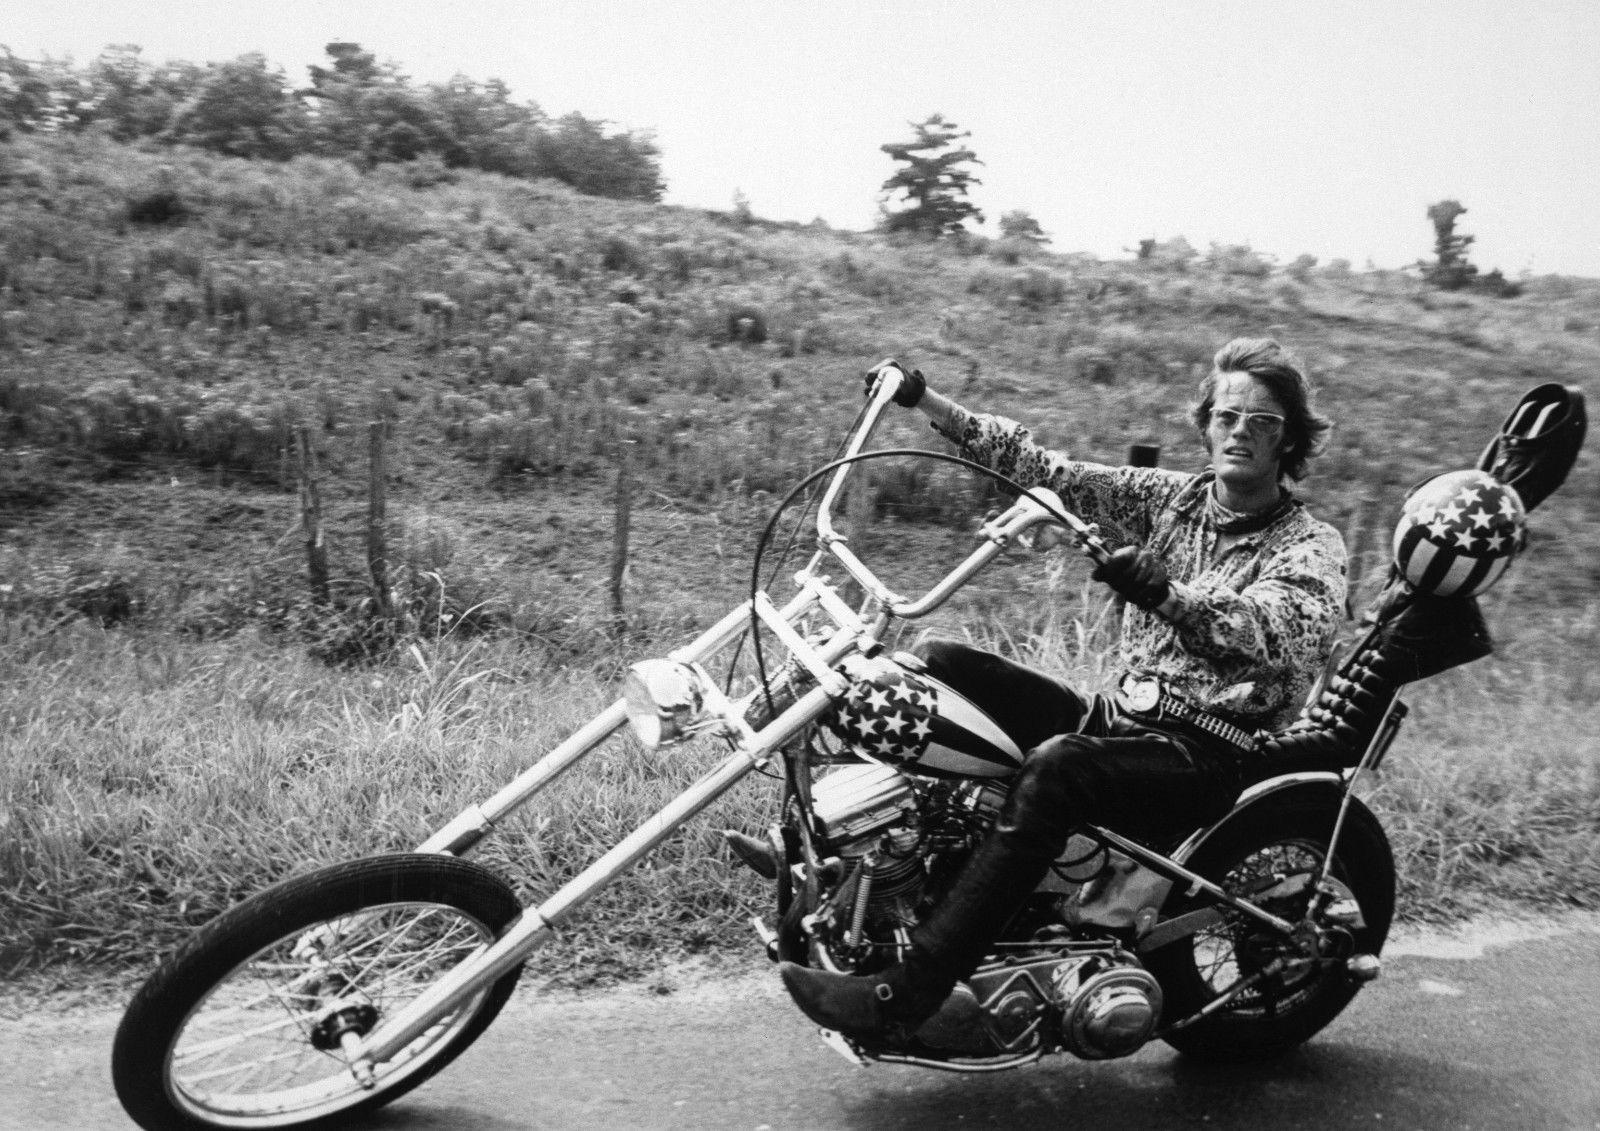 peter-fonda-in-easy-rider-art-silk-stampa